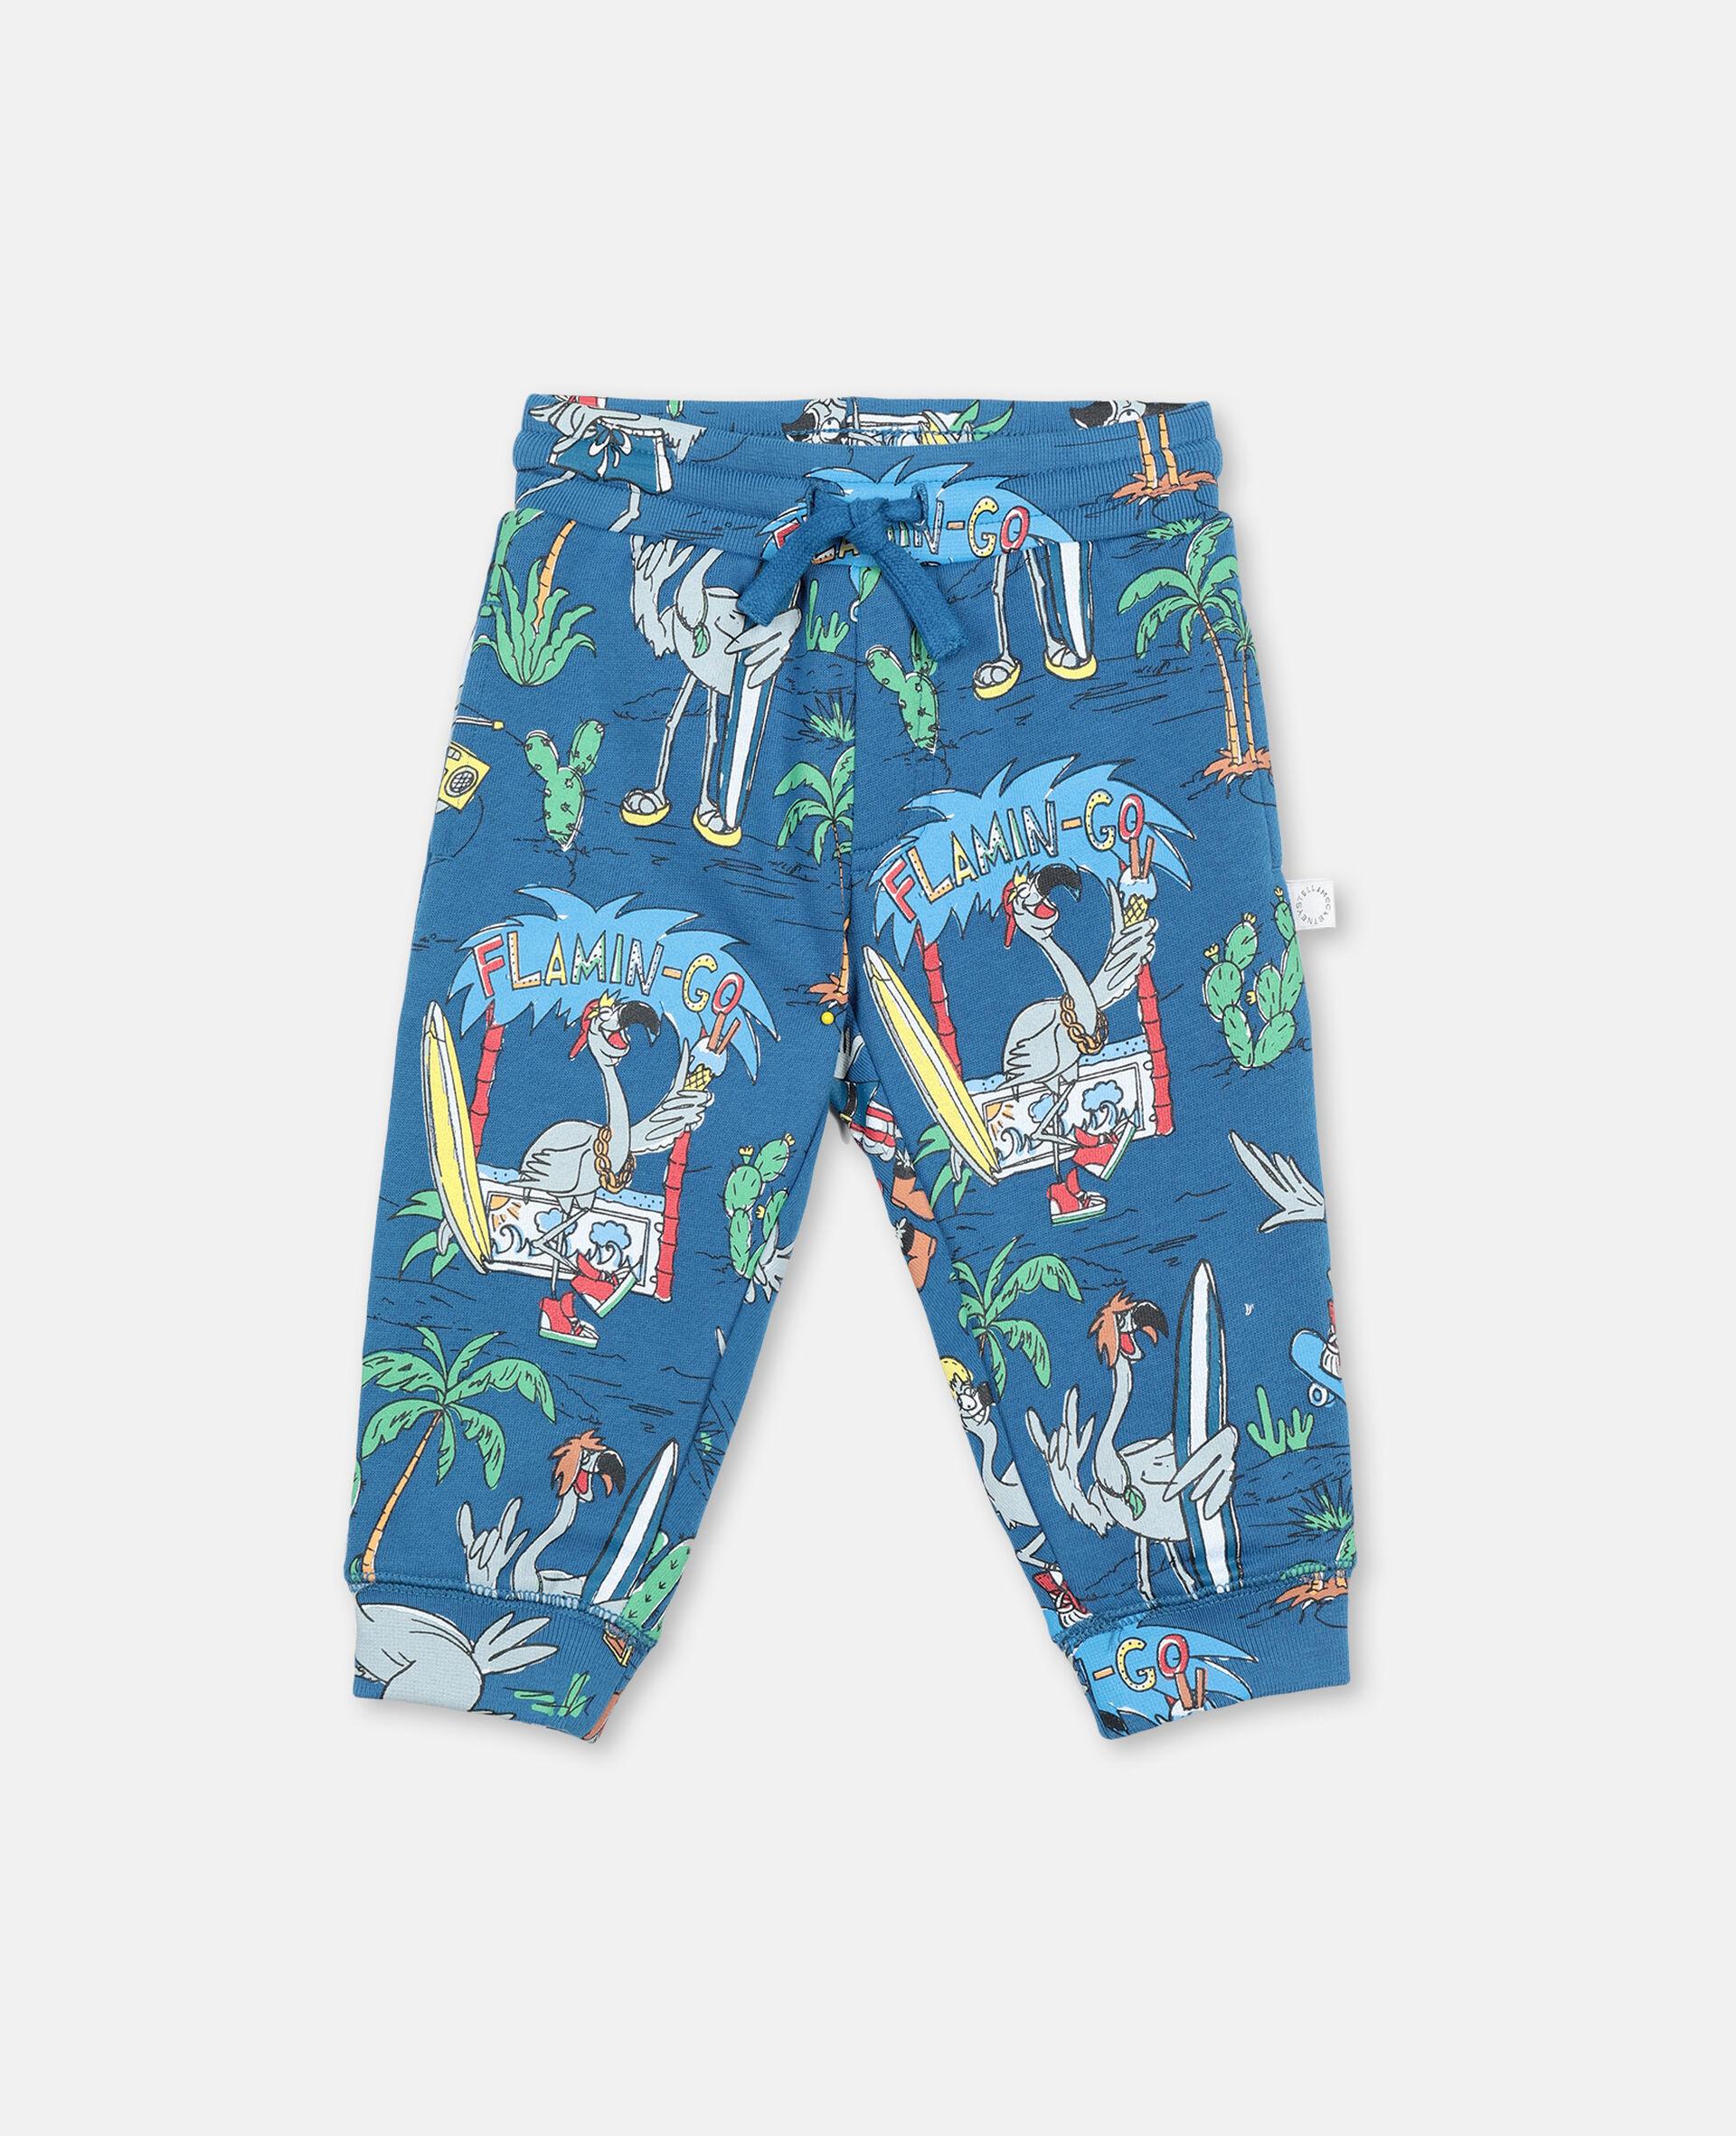 Flamingo Land 棉质运动裤-蓝色-large image number 0